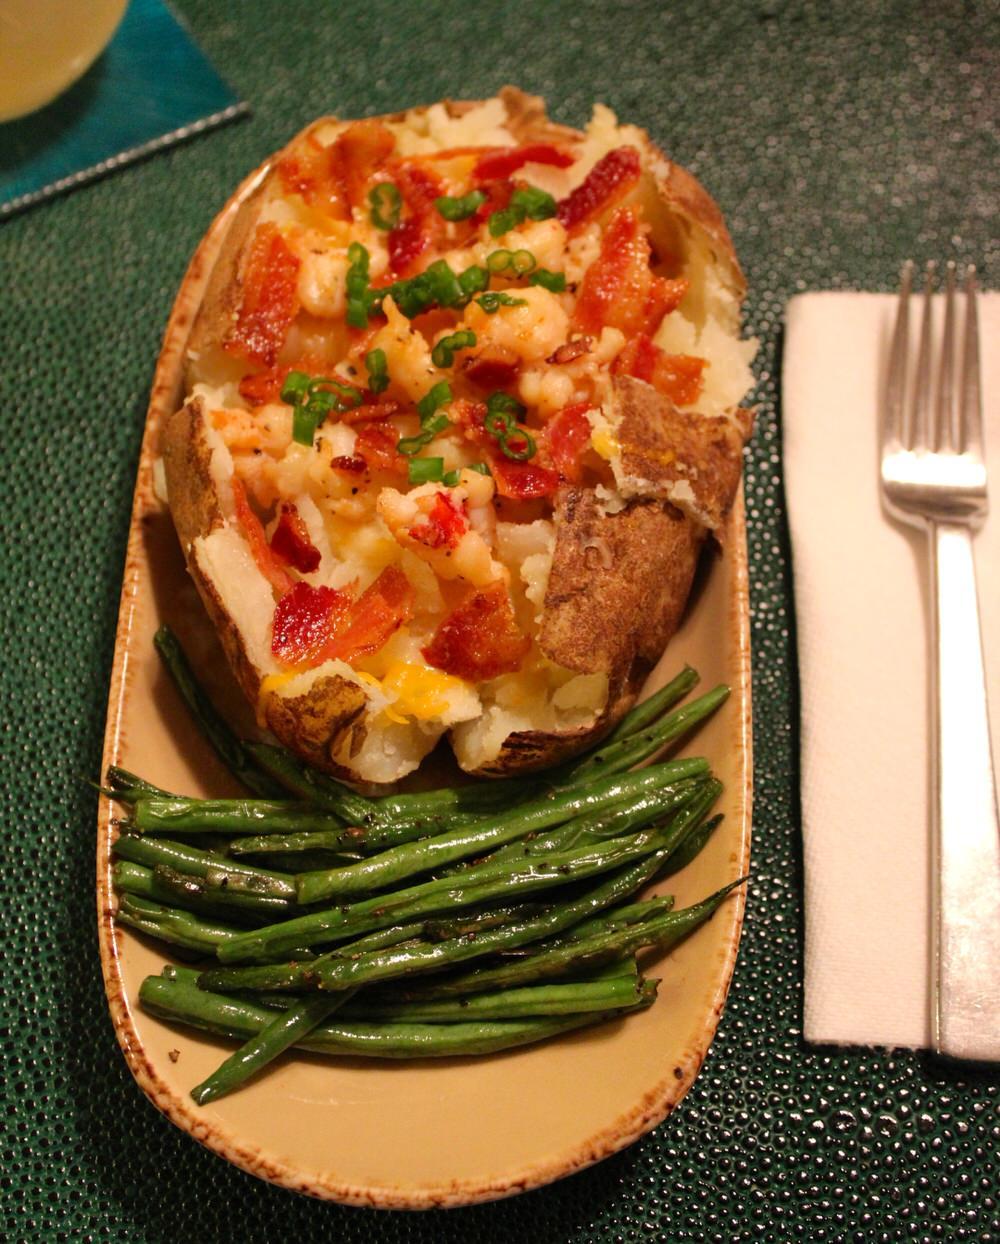 ~~ Lobster Stuffed Baked Potato ~~